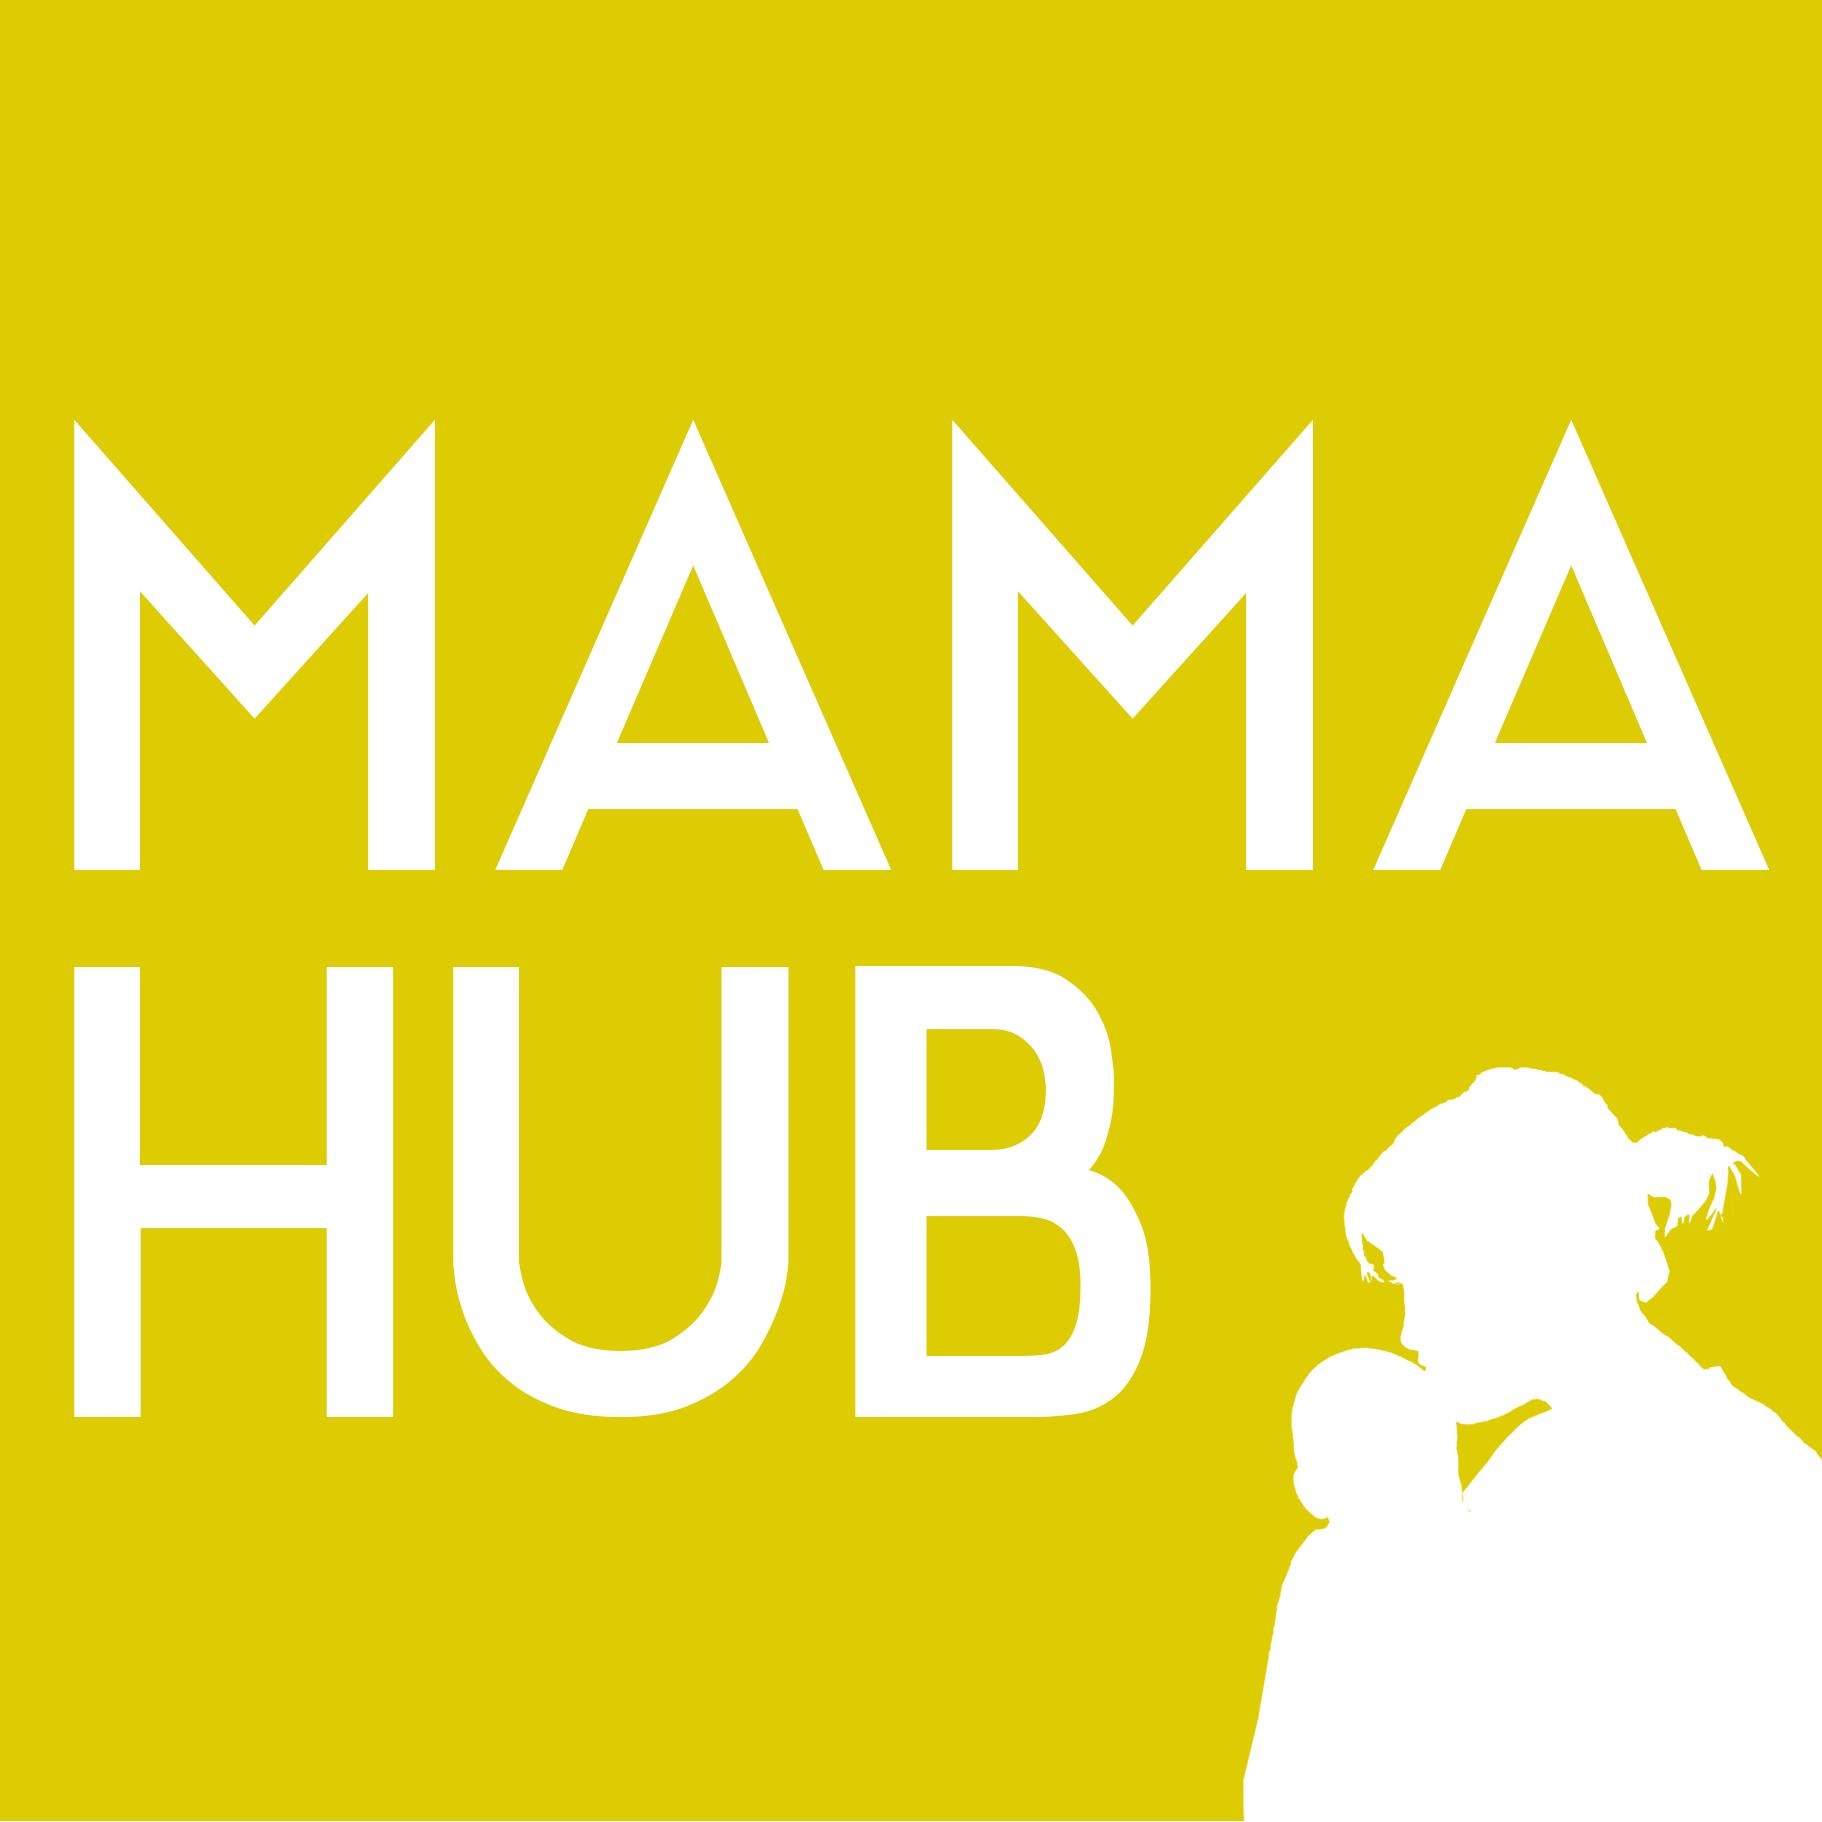 Mama-Hub-Ochre.png